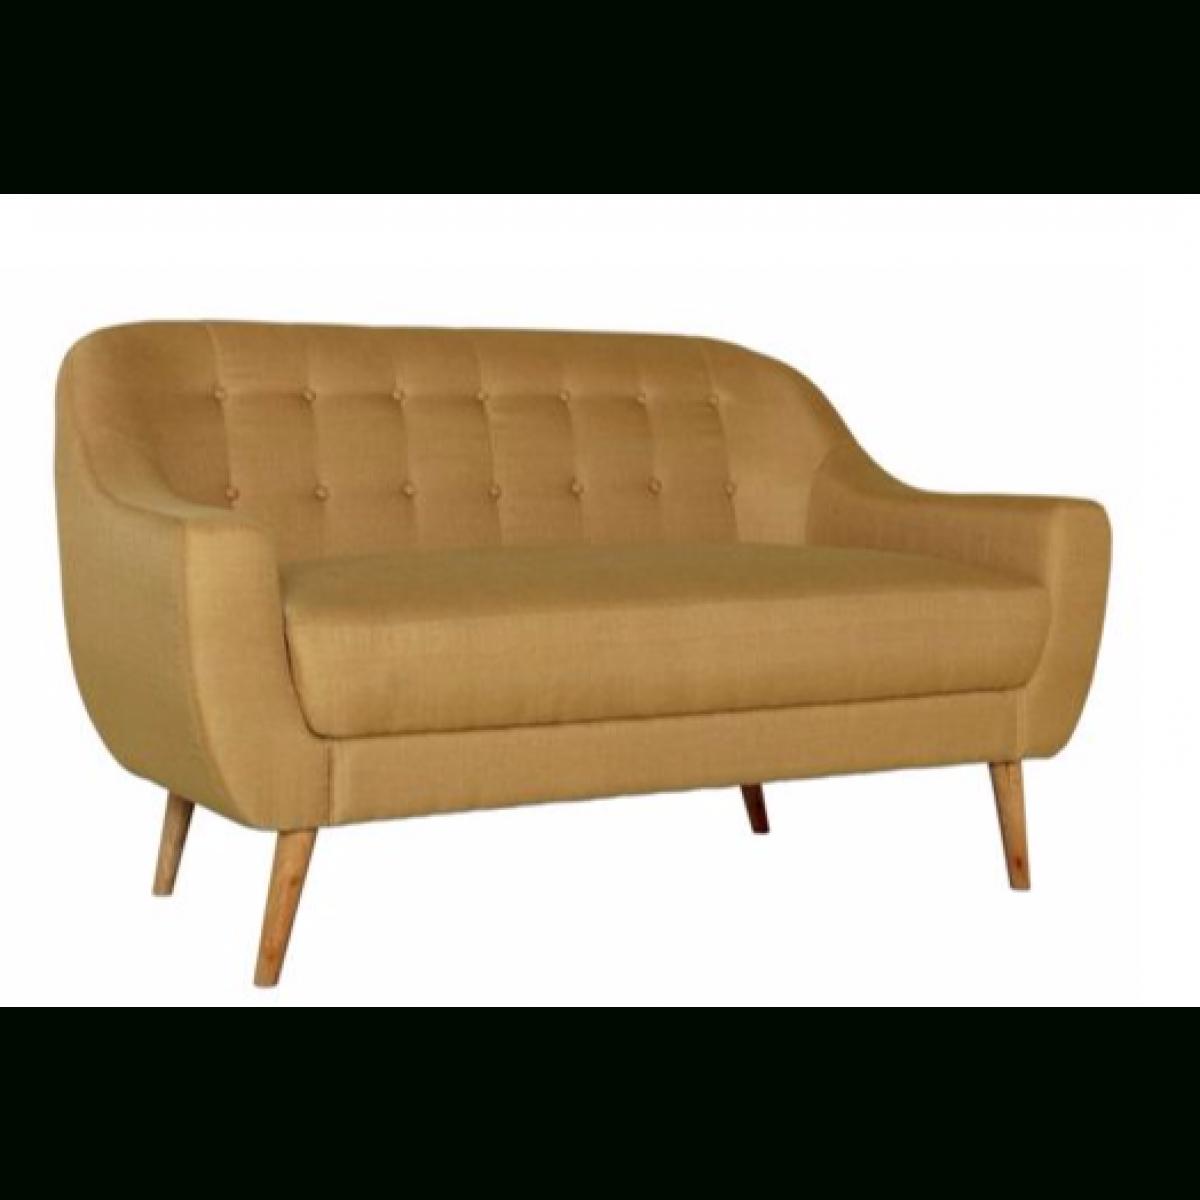 Hygena Lexie Retro Fabric Sofa 2 Seater Lemon Yellow (View 4 of 20)